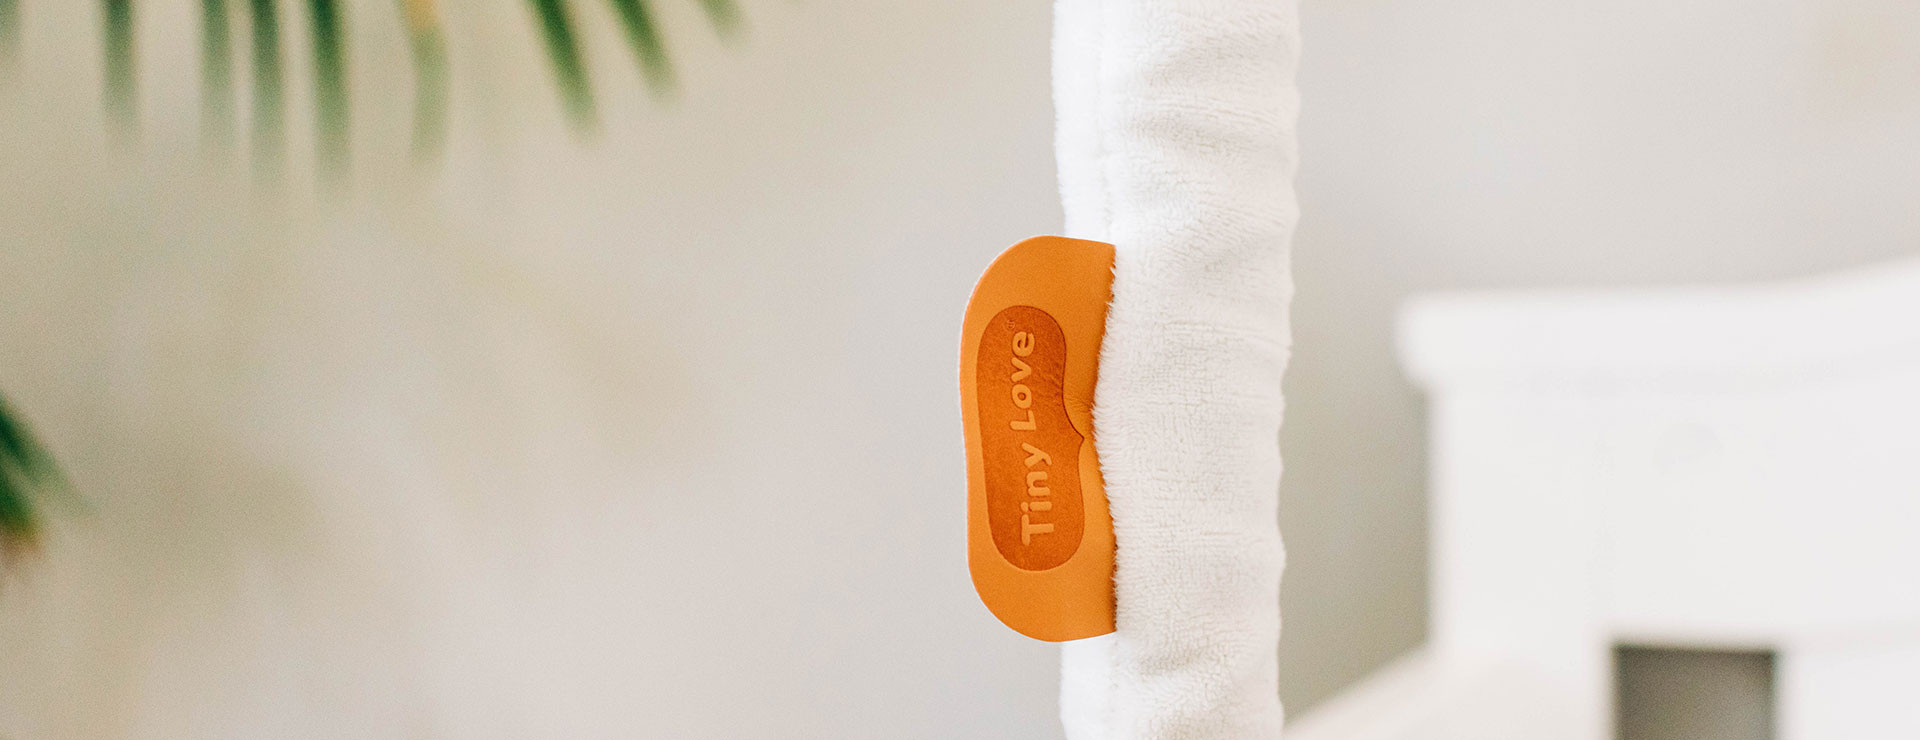 Soft mobile arm cover for extra coziness